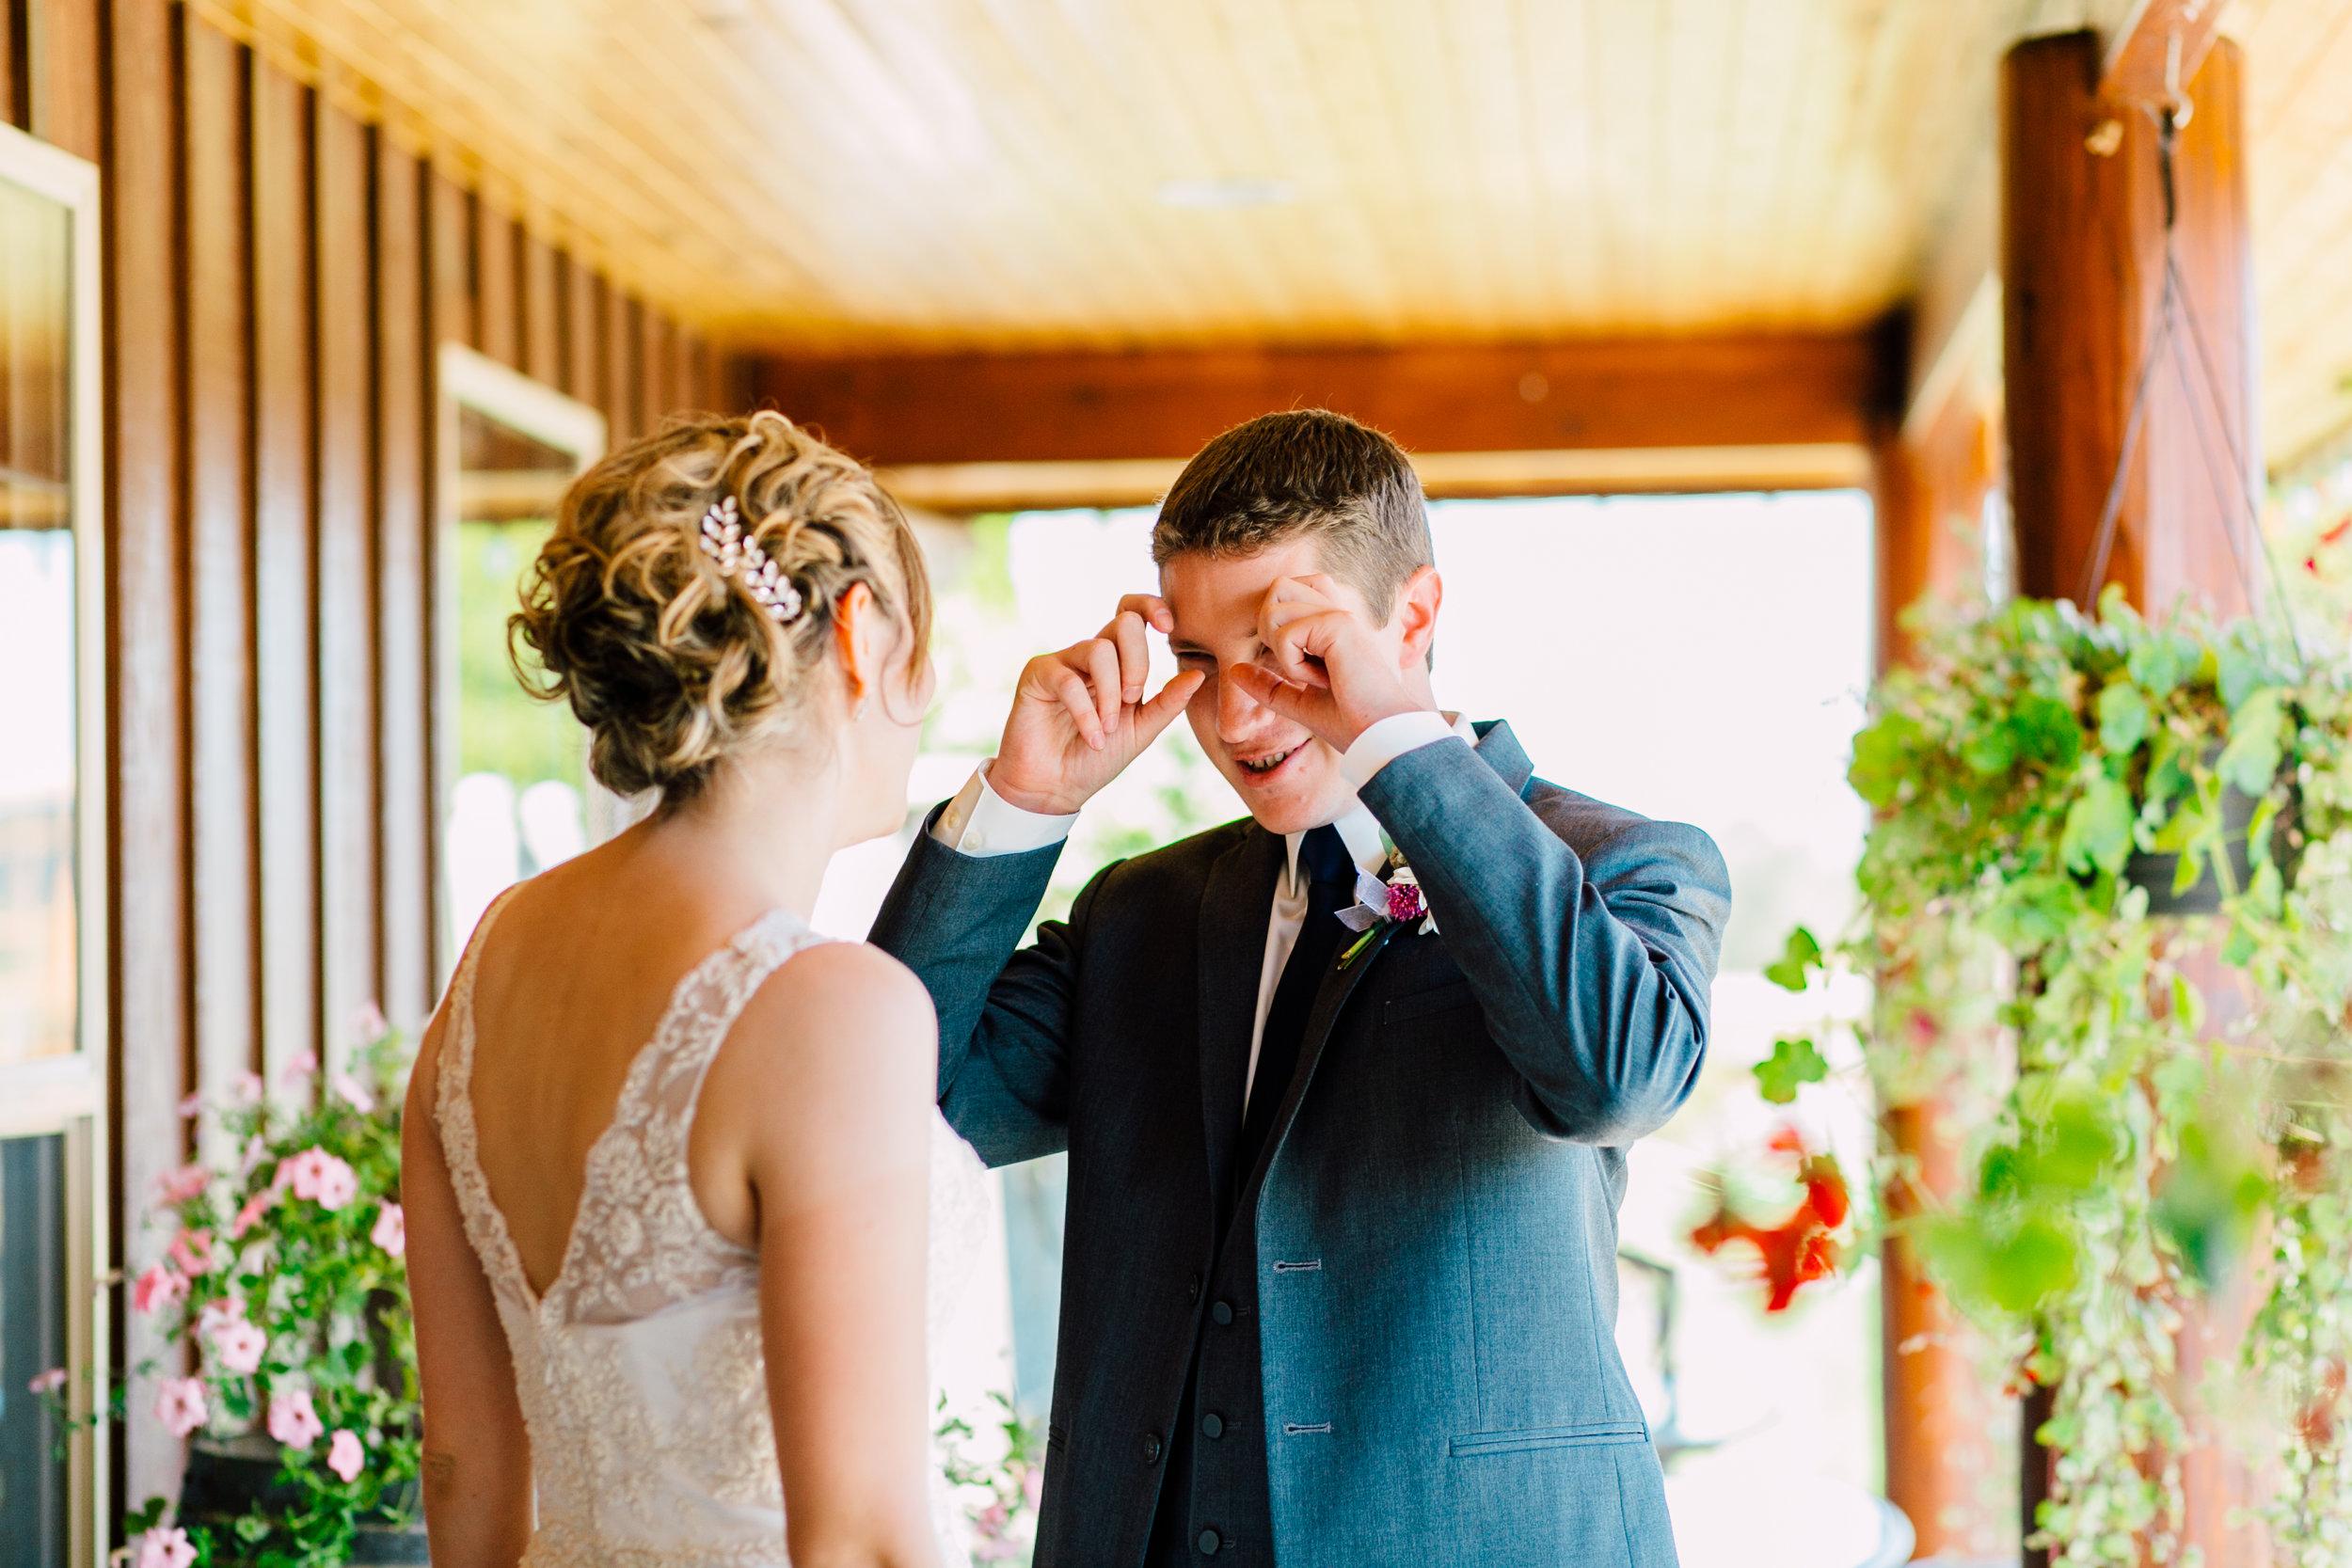 samson-winery-wedding-katheryn-moran-jillmike-90.jpg